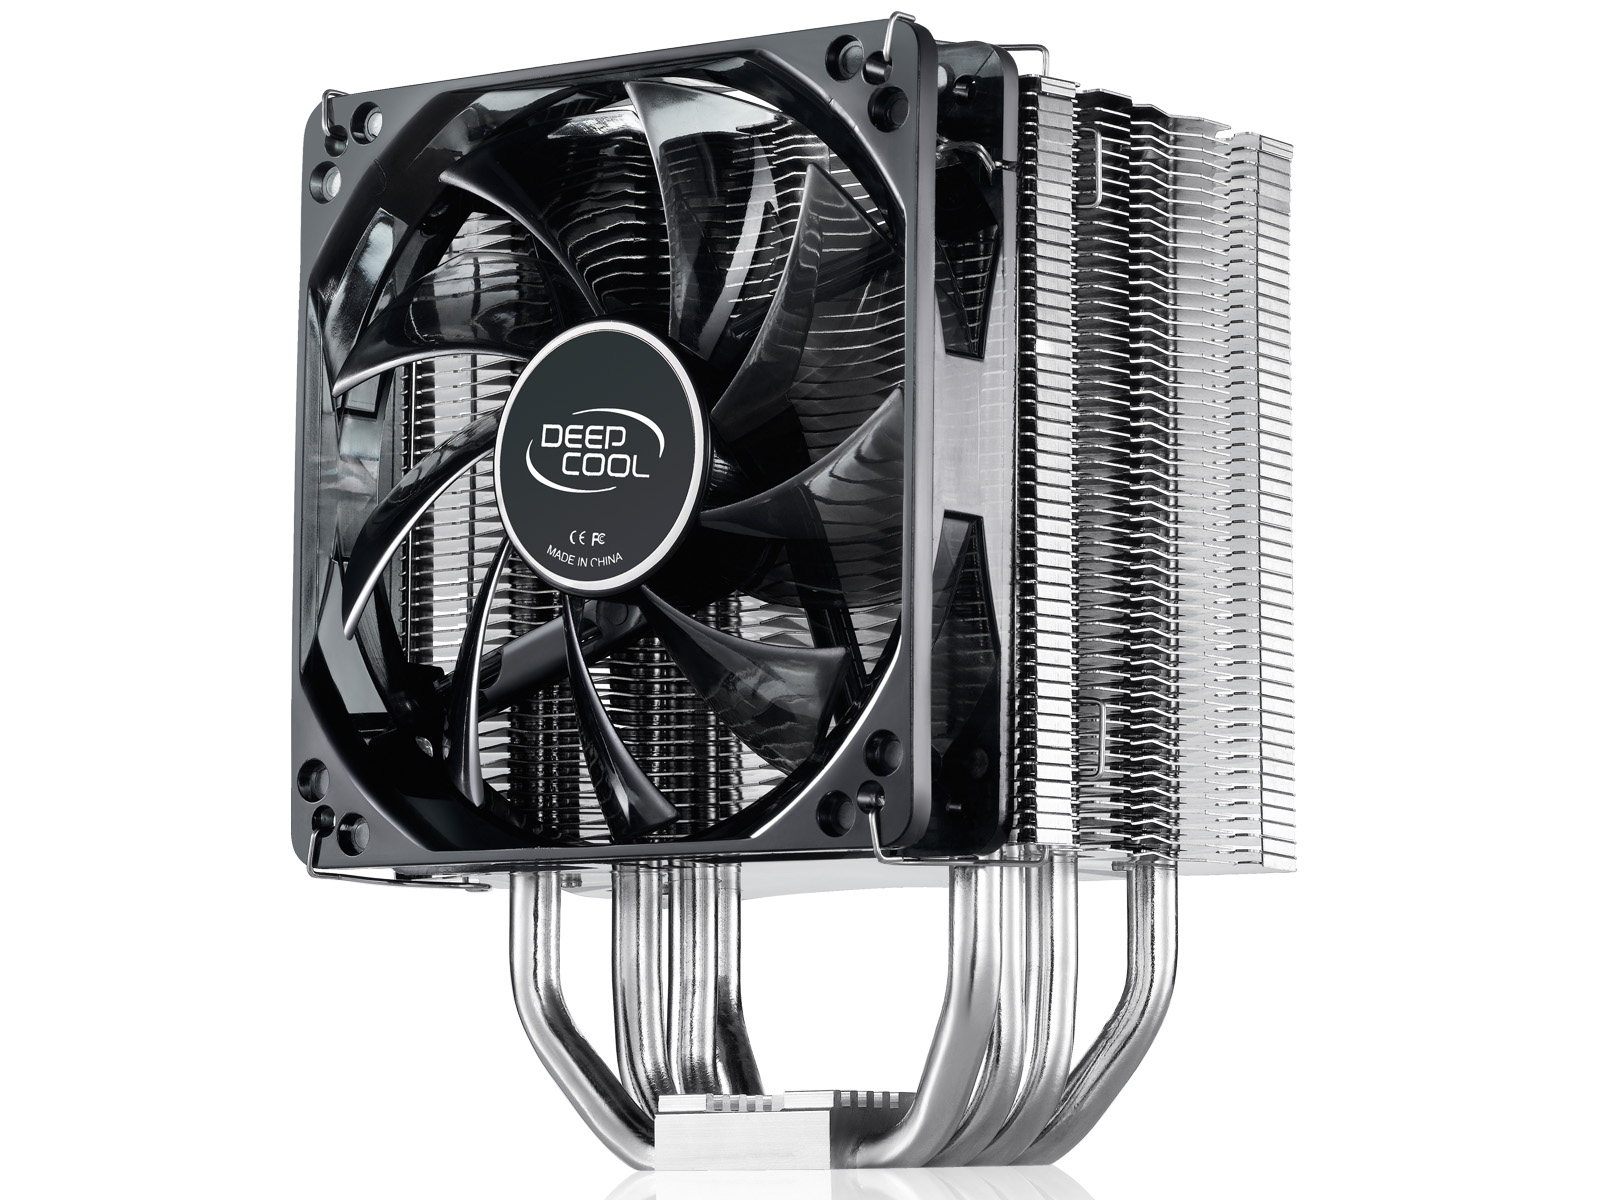 Купить Кулер для процесора Deepcool ICE BLADE PRO V2.0 (ICE BLADE PRO V2.0)